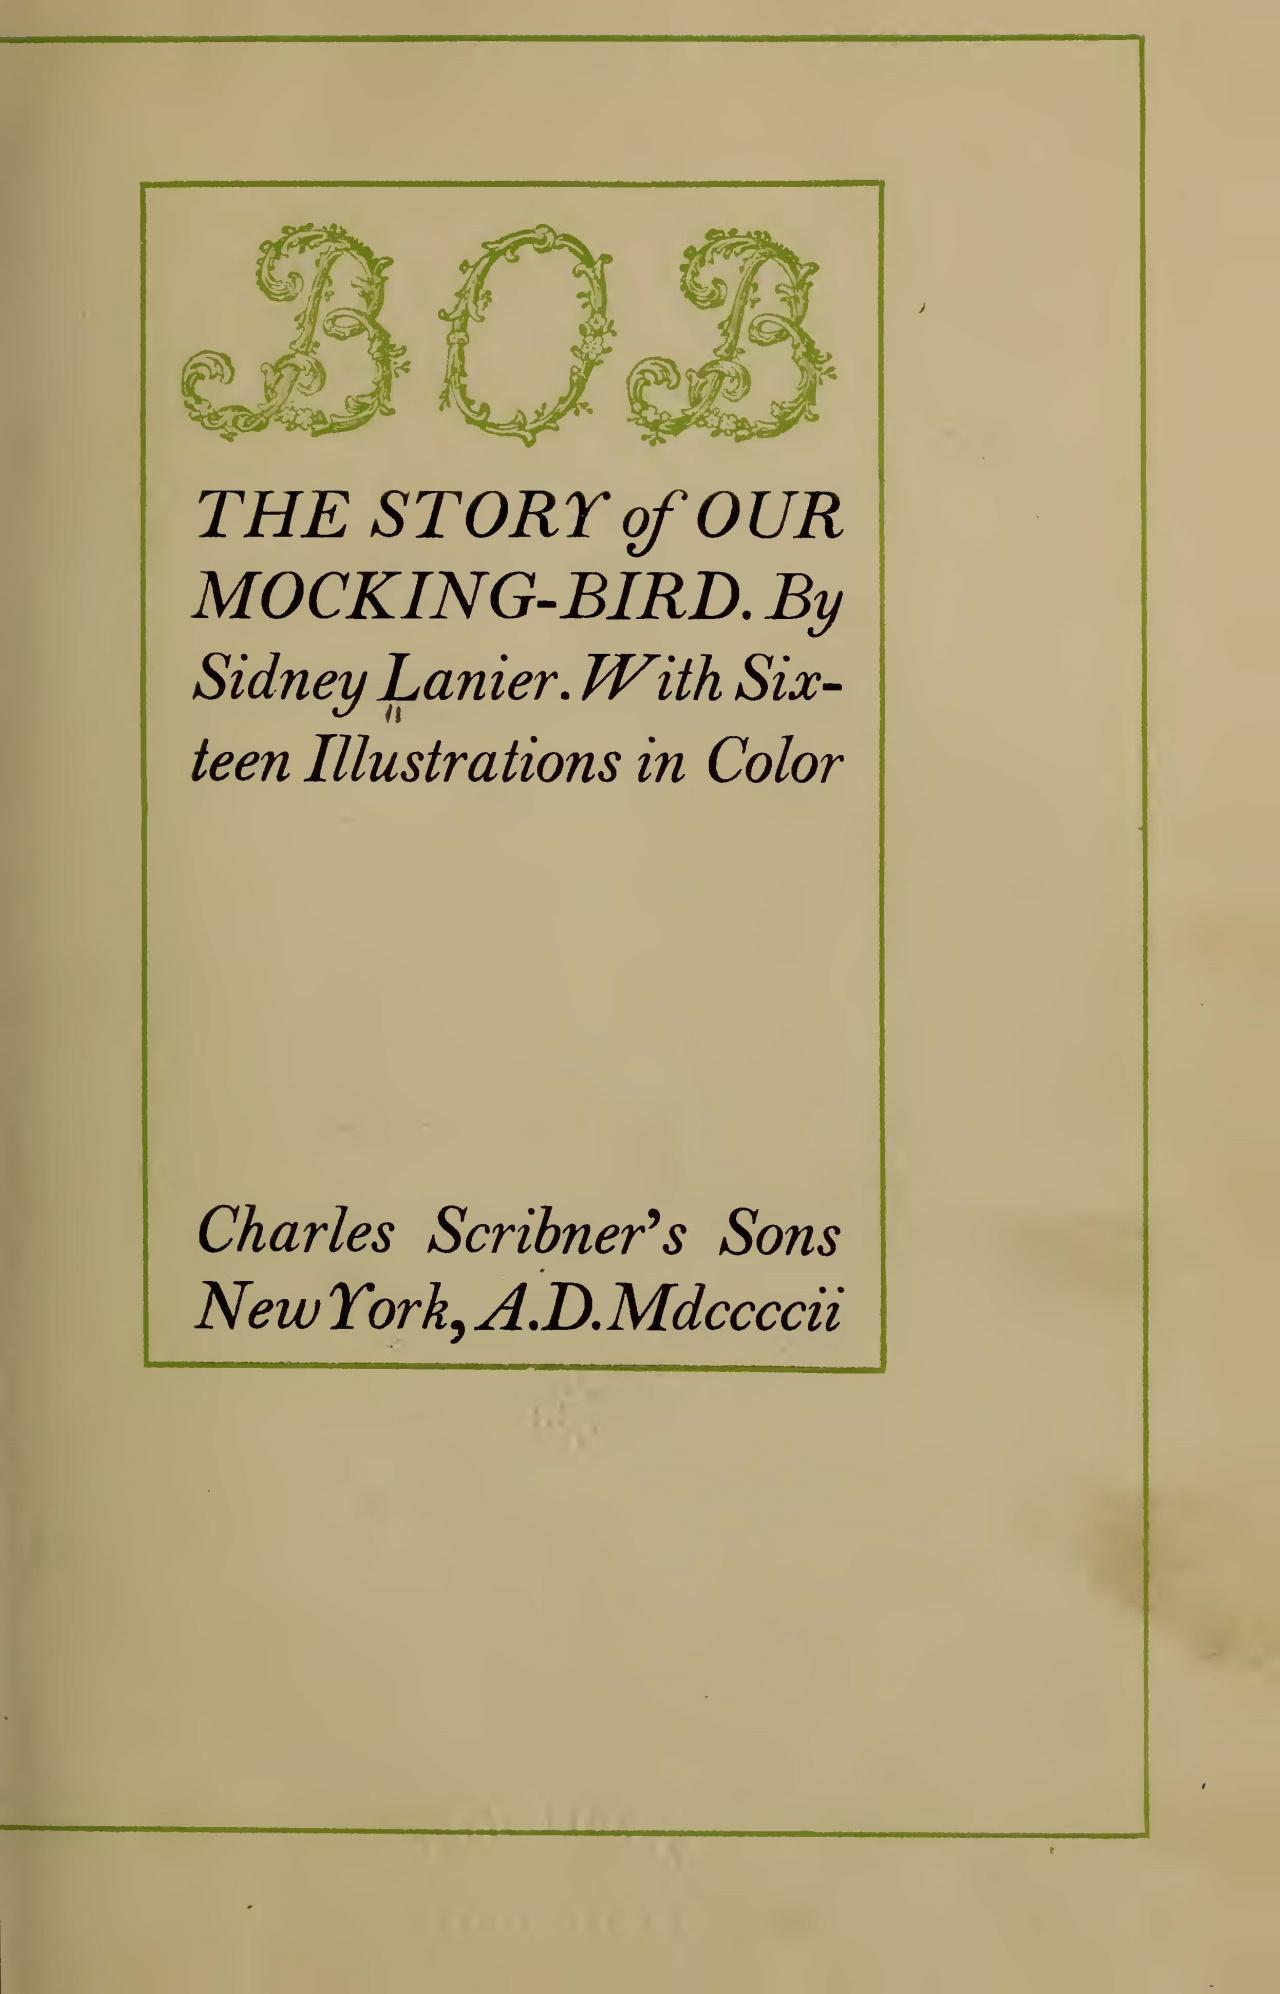 Lanier, Sr., Sidney Clopton, Bob the Story of Our Mocking Bird Title Page.jpg